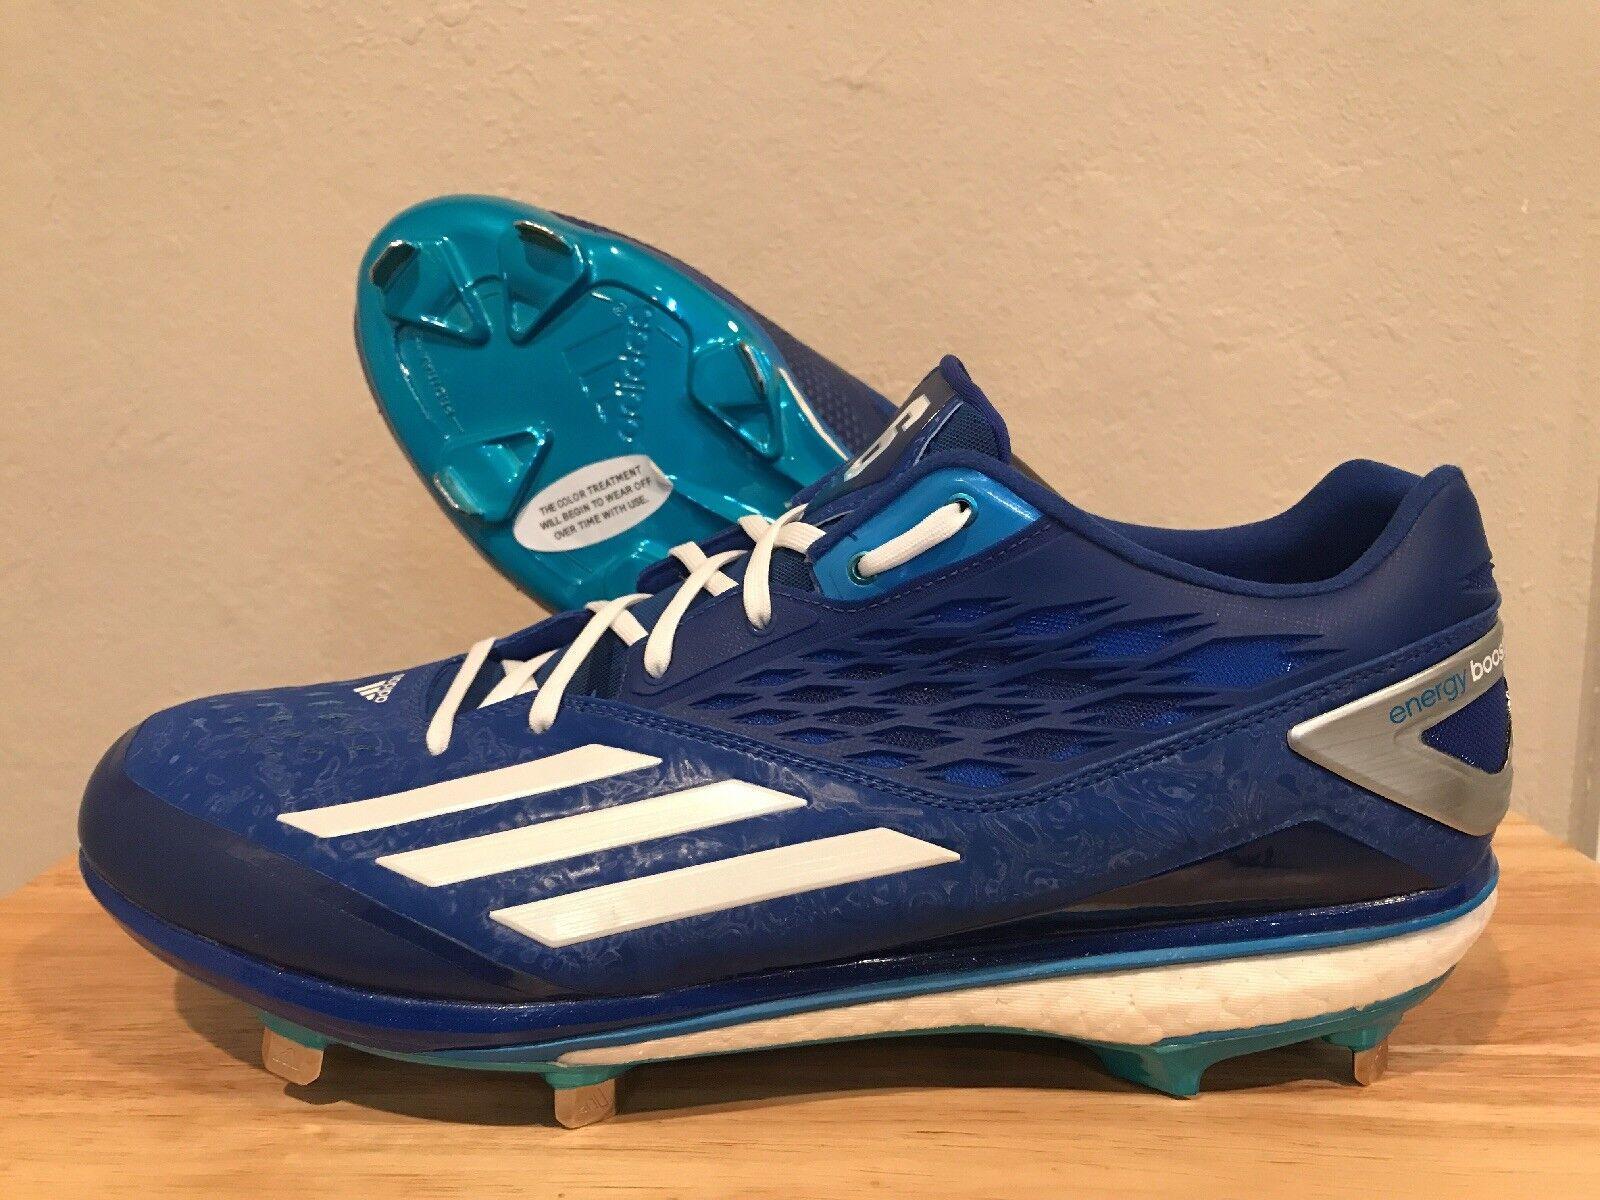 Adidas Energy Boost Icon Lorenzo Cain PE Baseball Cleats bluee Size 13 (AQ8401)